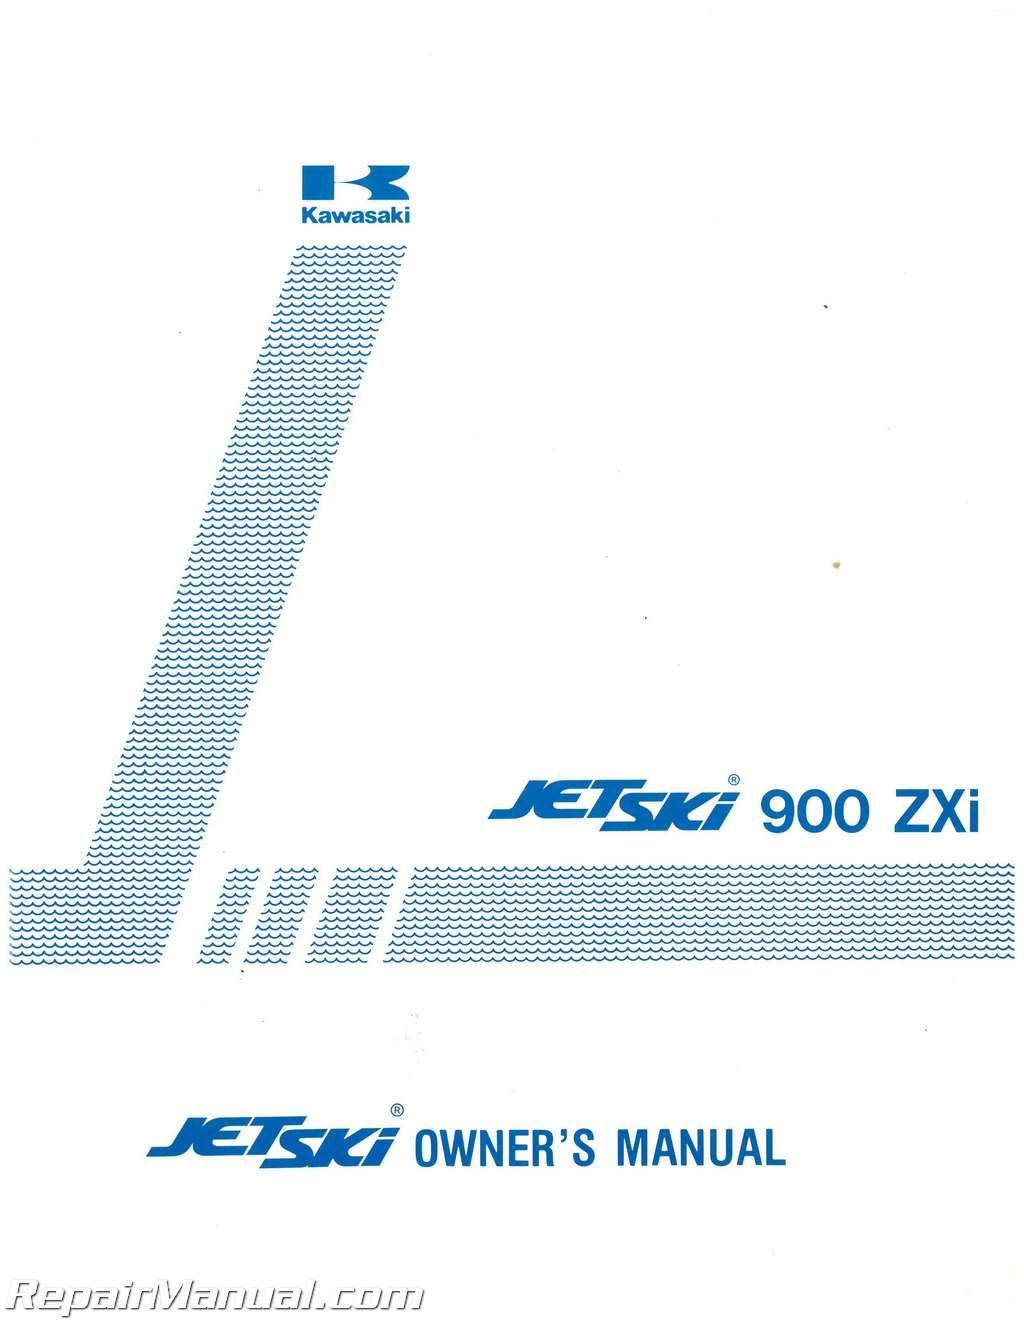 kawasaki jh900a1 jet ski 900zxi 1995 factory owners manual rh repairmanual  com ZXI 1100 Engine 1998 kawasaki zxi 1100 jet ski owners manual